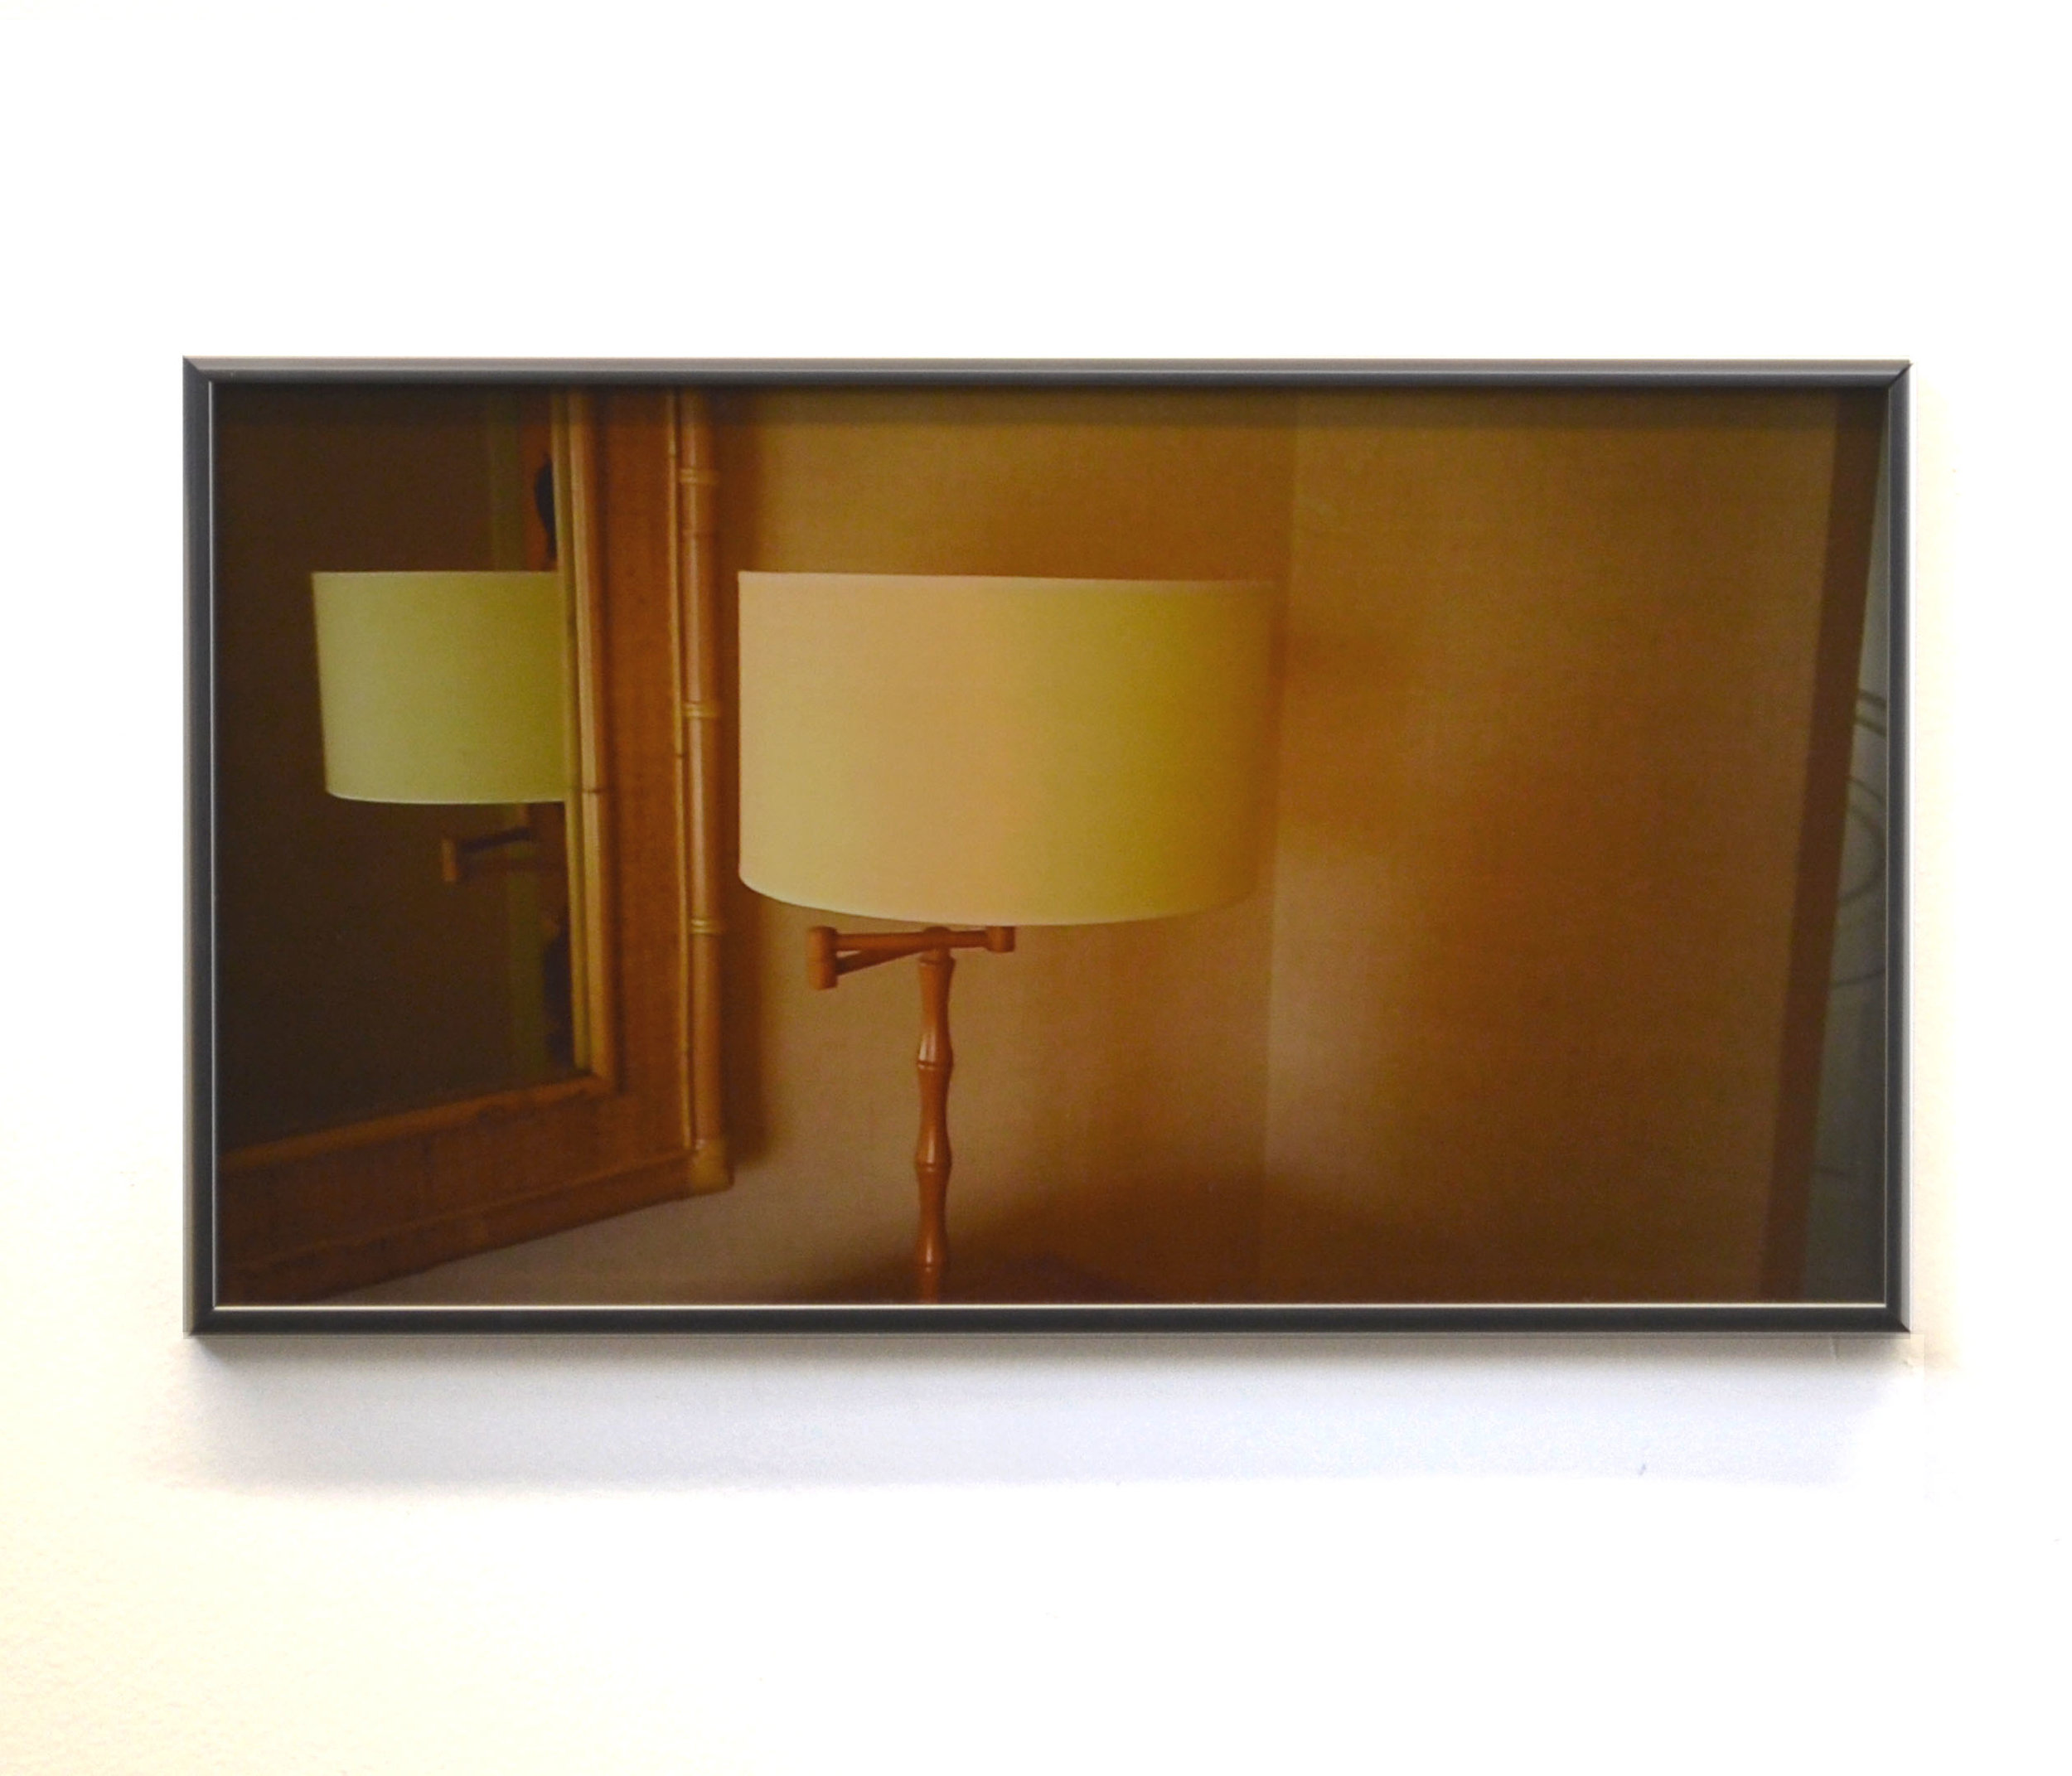 Megan Plunkett, Minor Role, 2018, digital C-print on glossy paper, aluminum frames, 9 × 16 in